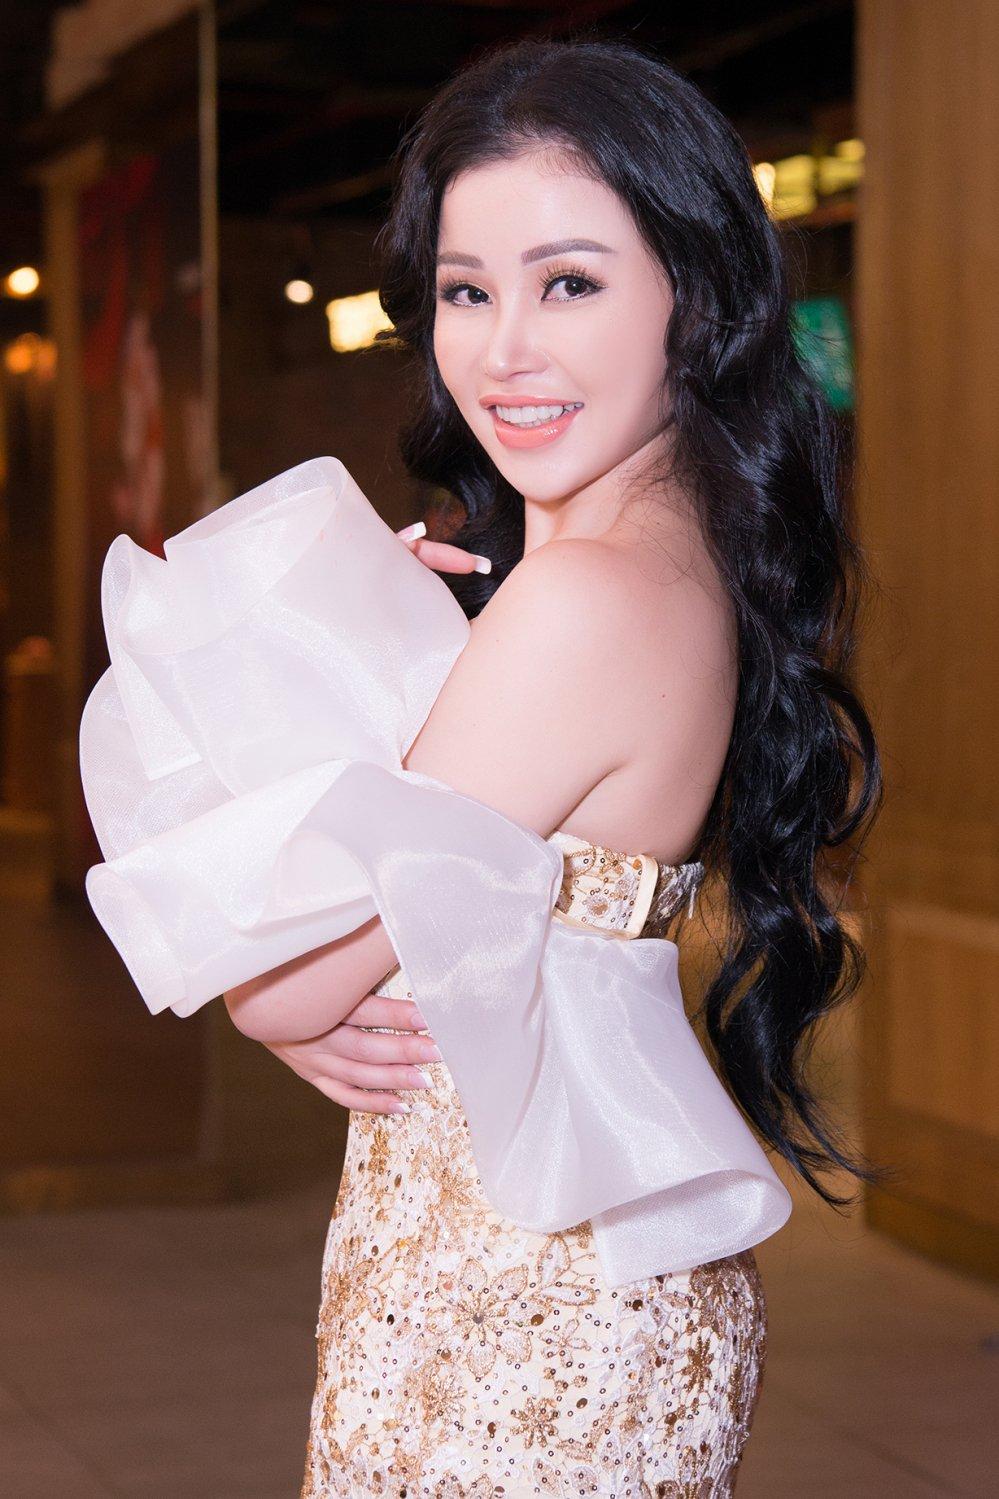 Hoa hau Janny Thuy Tran bi thuong khap nguoi khi quay MV cung Tang Nhat Tue hinh anh 3